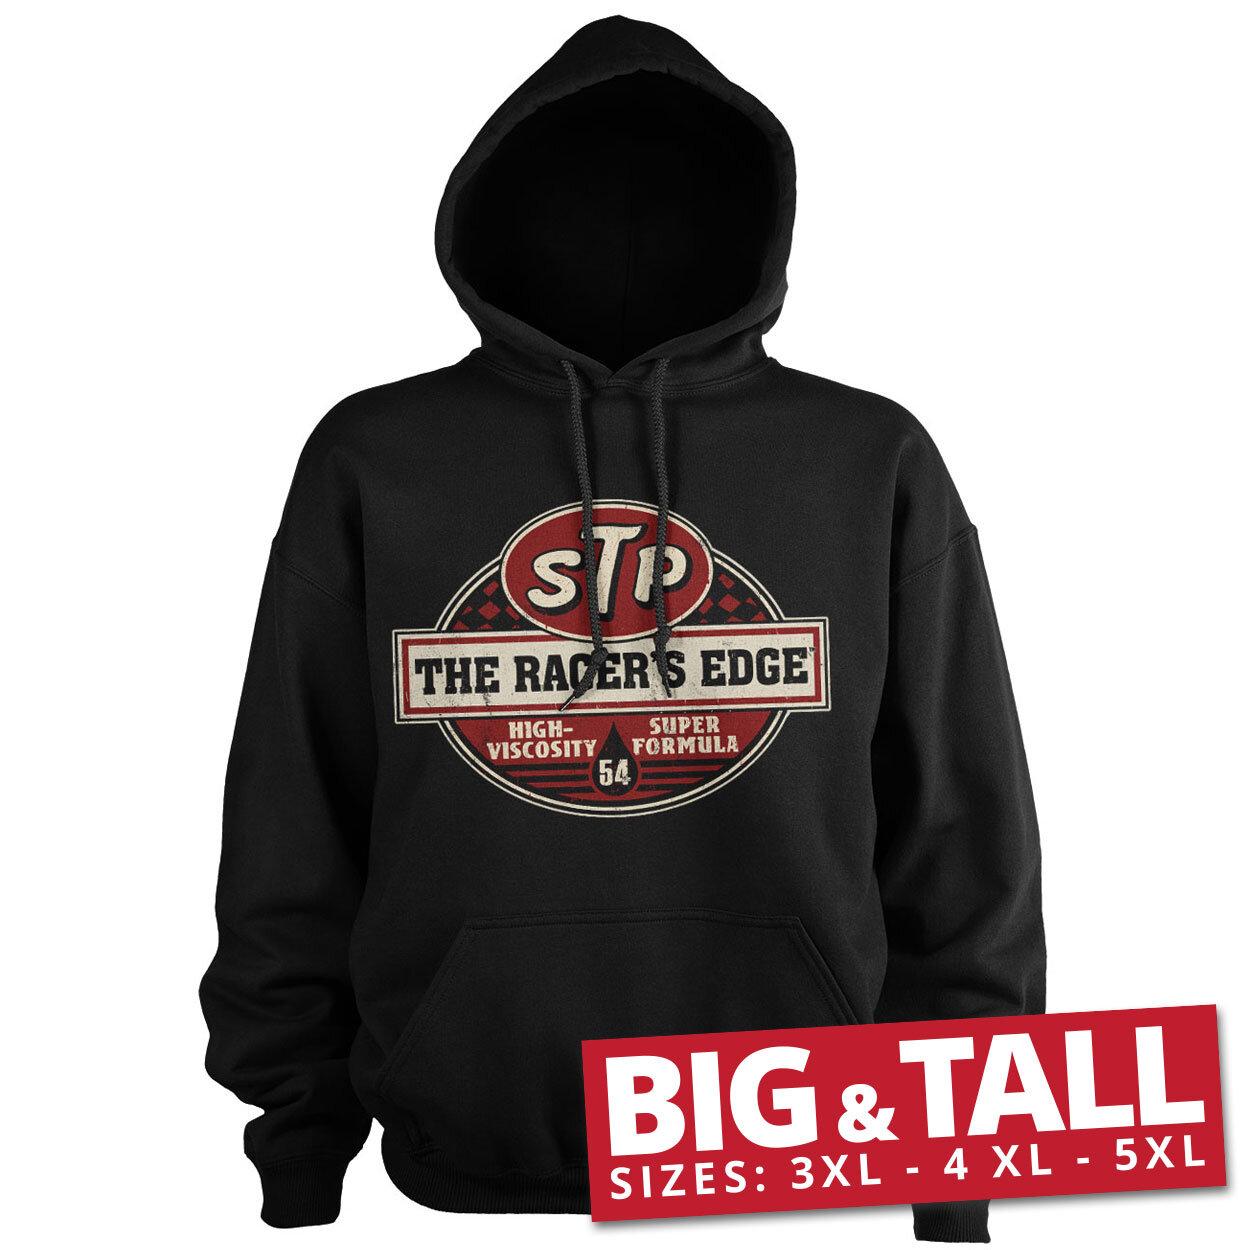 STP - Super Formula Big & Tall Hoodie